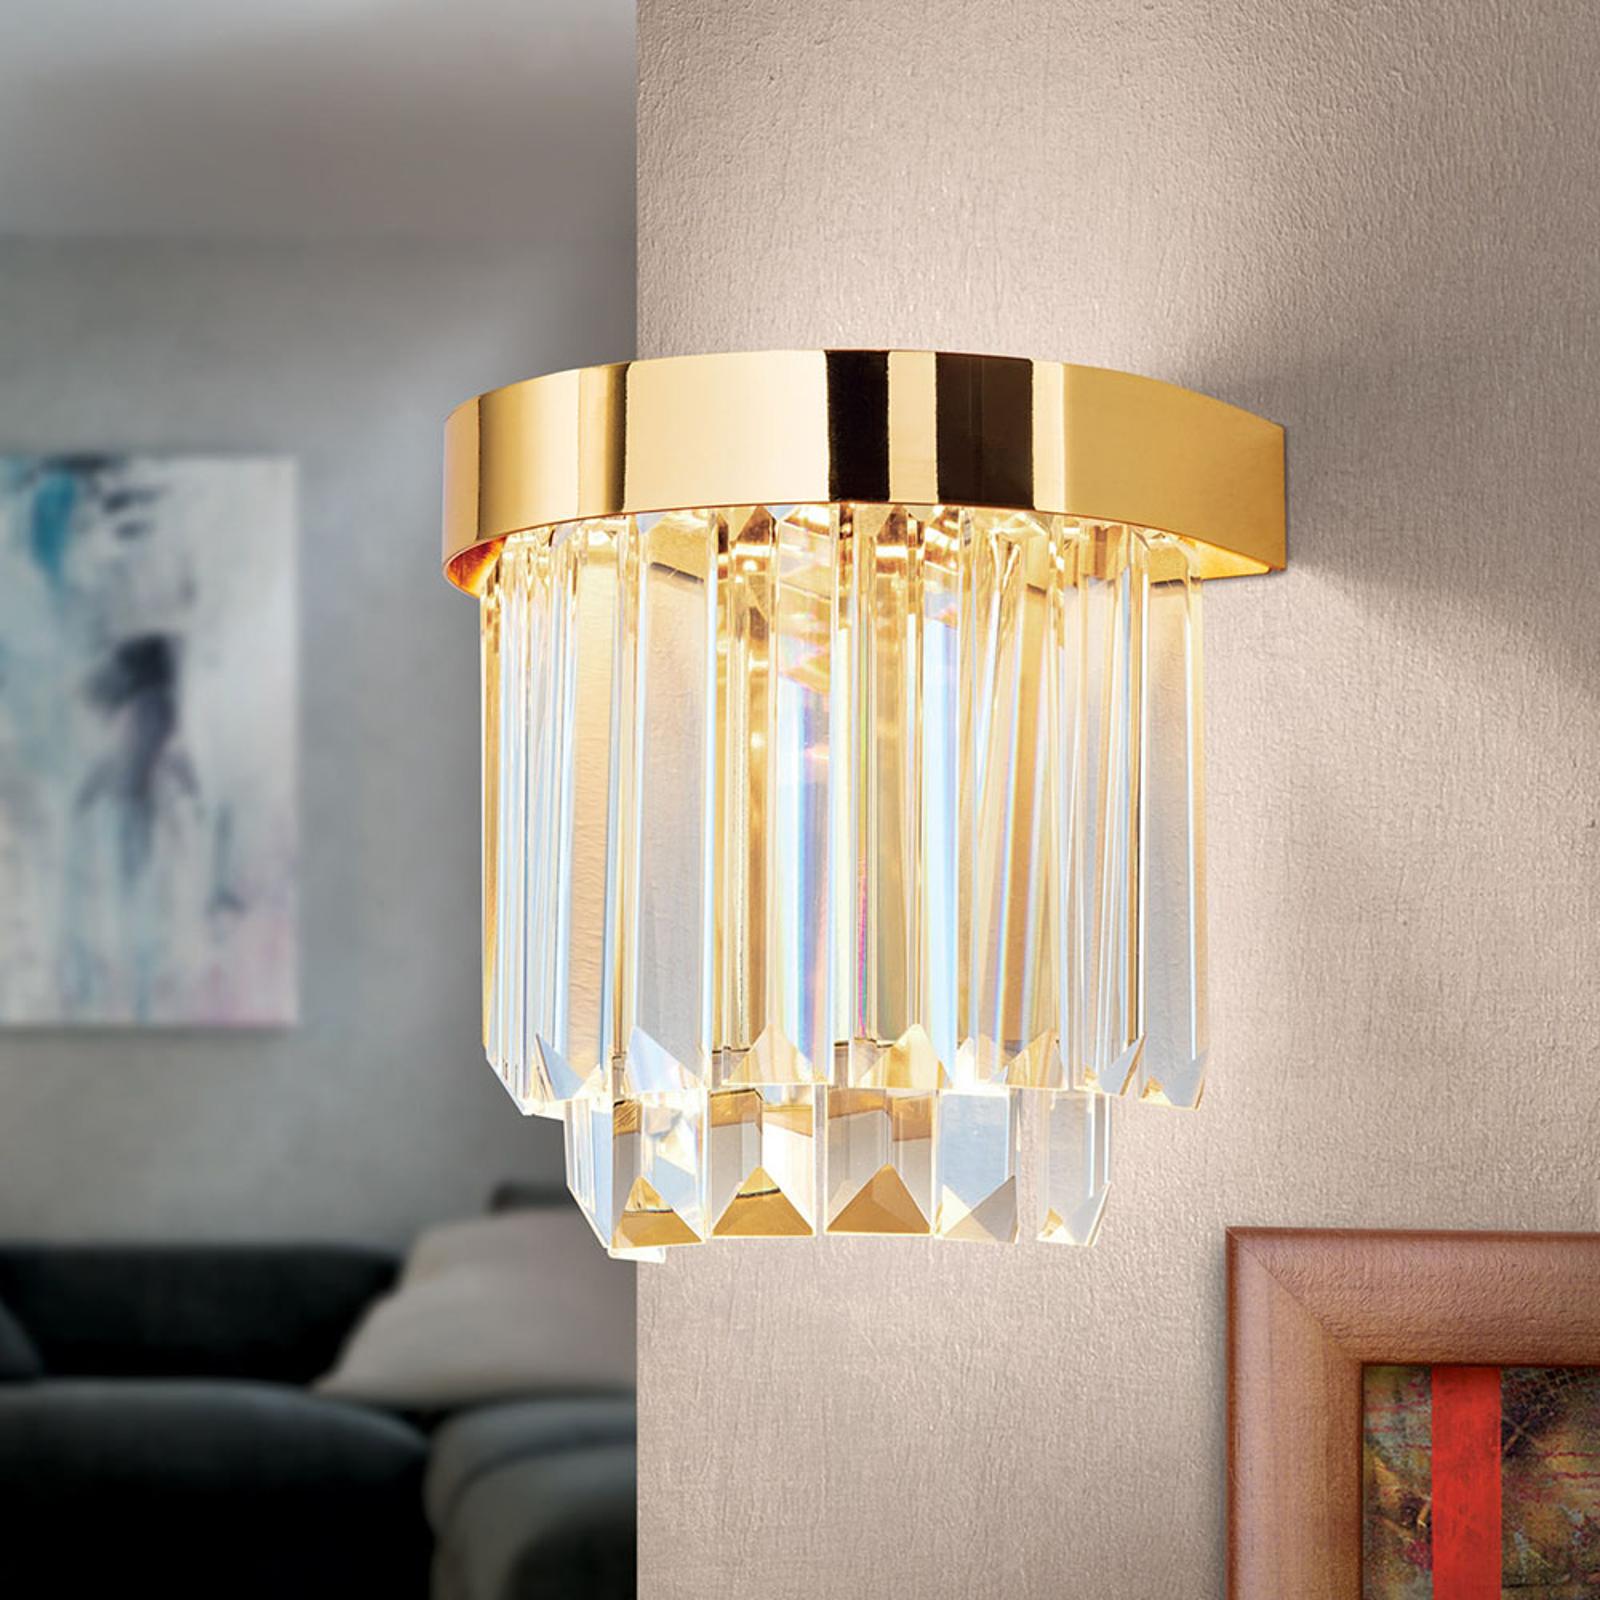 Kinkiet LED Prism z Up- and Downlight, złoty